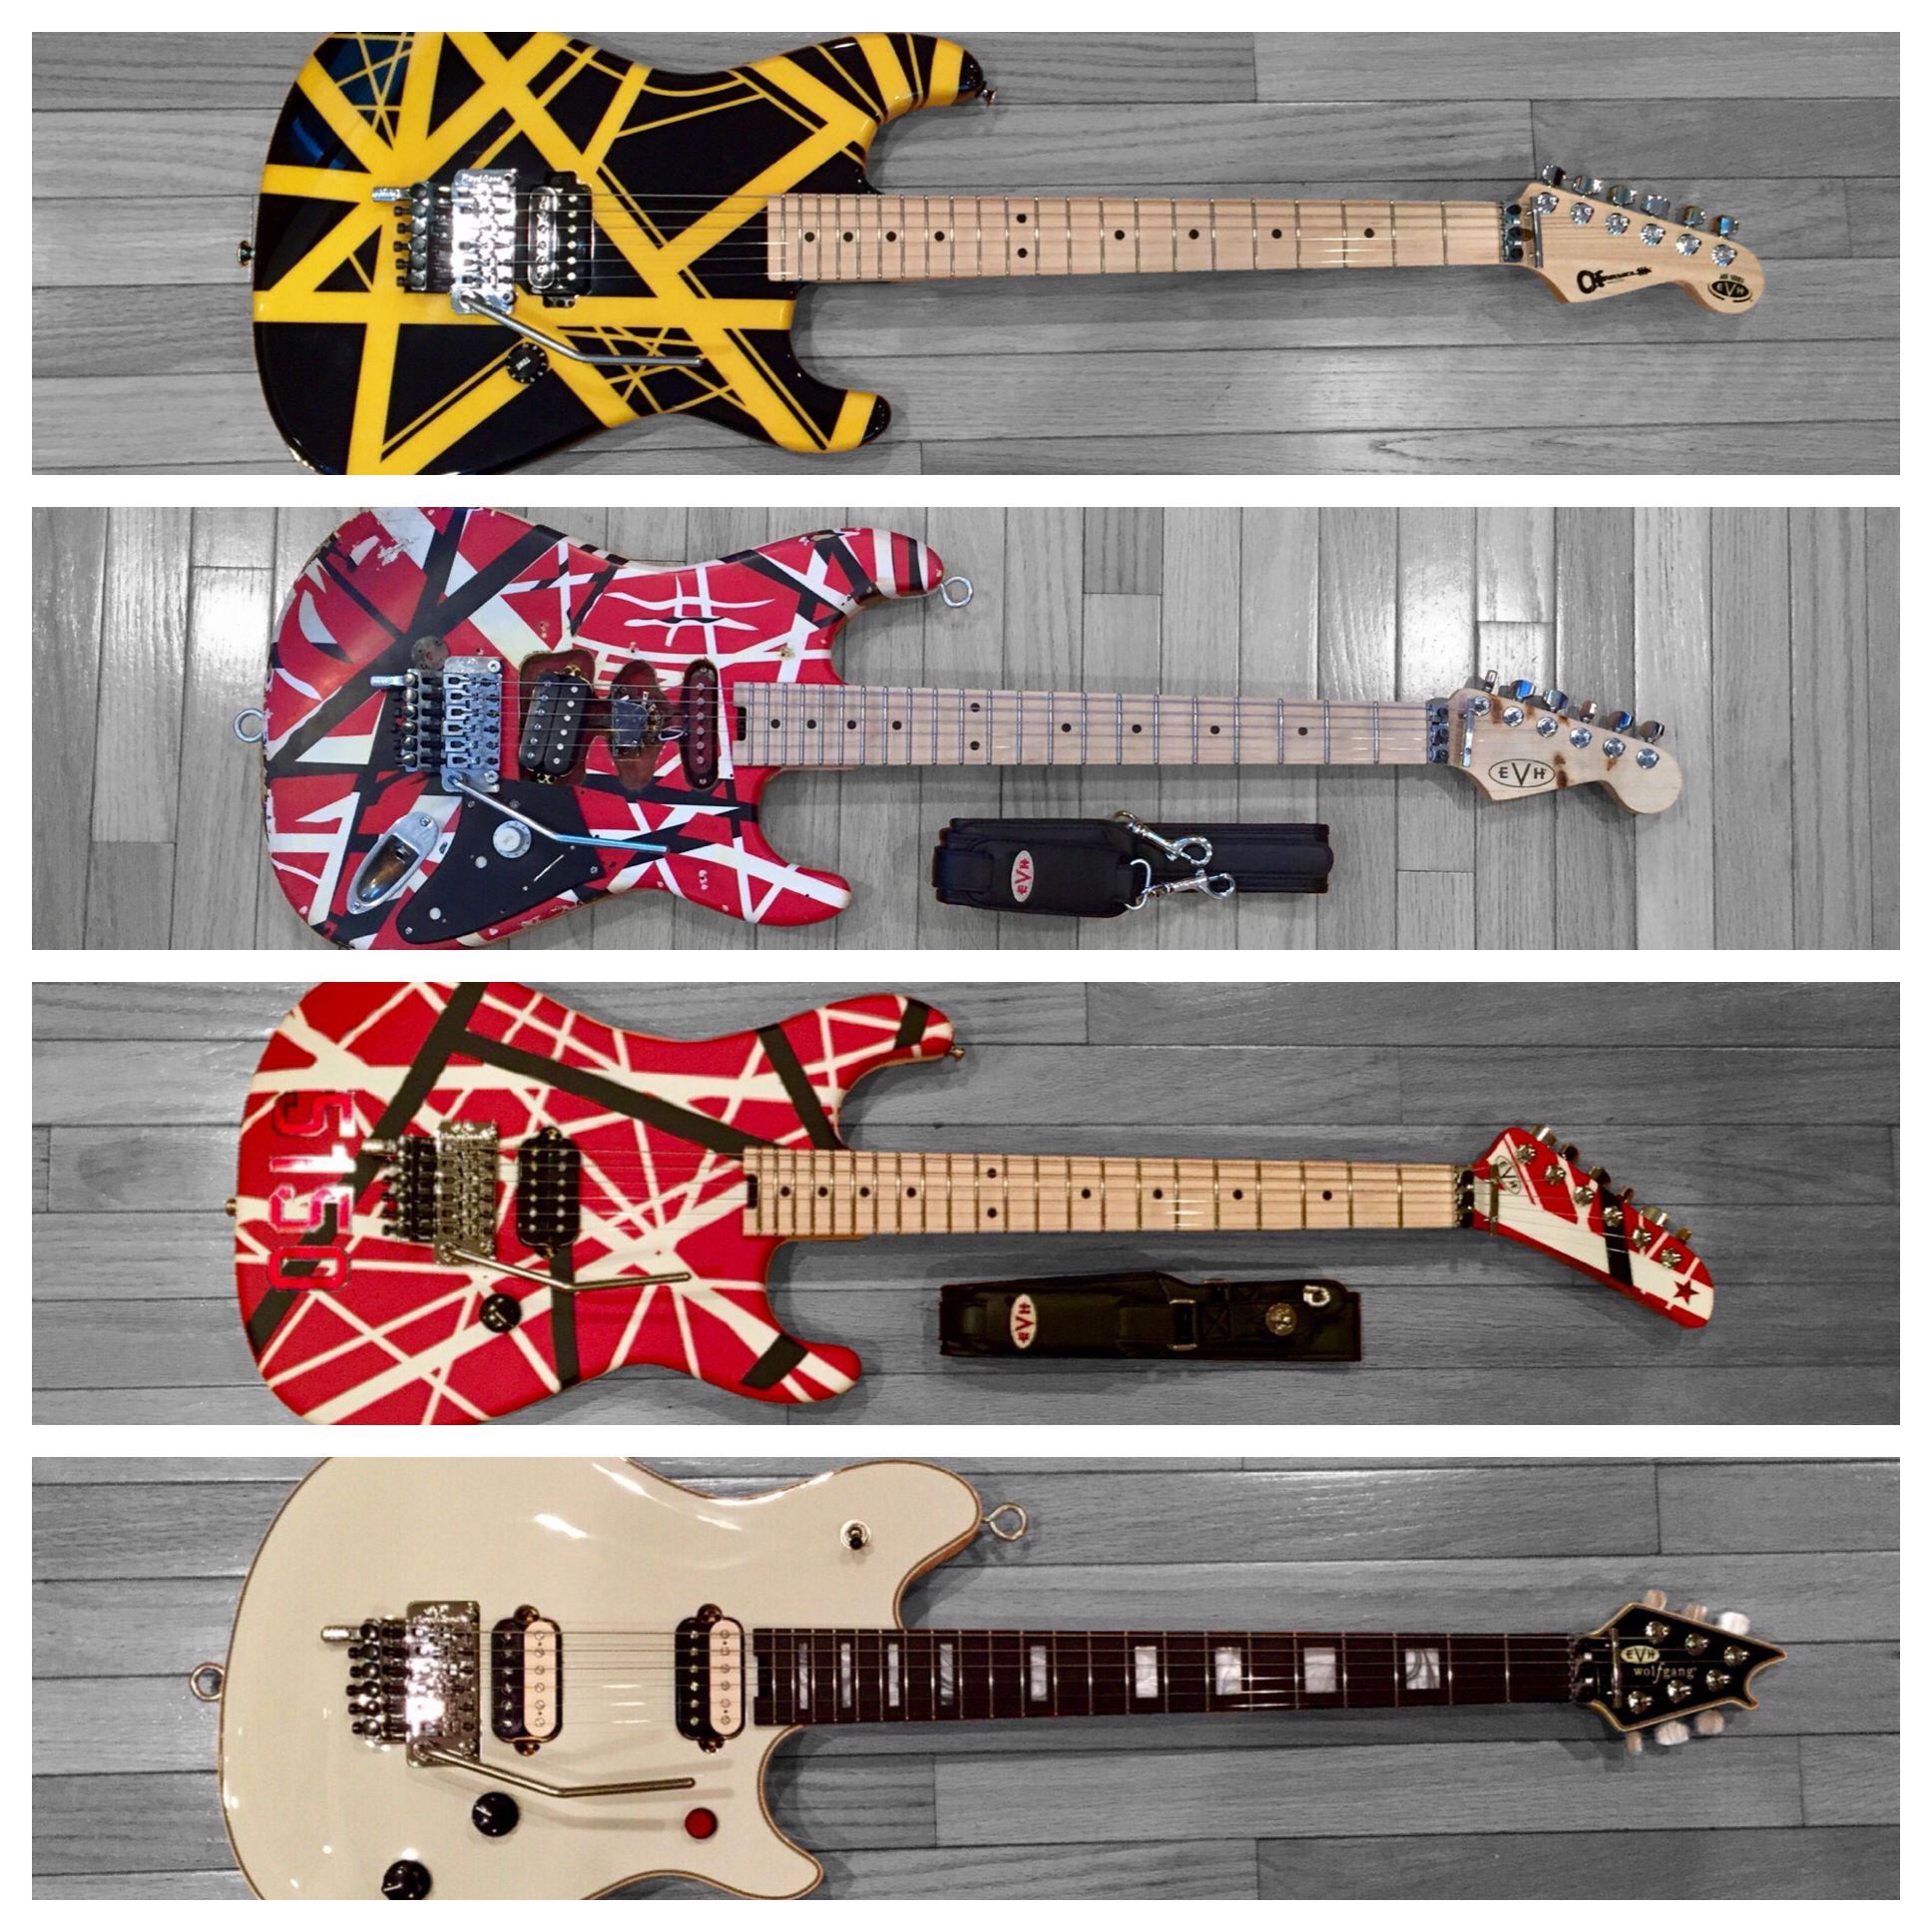 Charvel Evh Yellow Black Striped Judah Guitars Fender Evh Frankenstrat Fender Evh 5150 Evh Wolfgang Usa Unique Guitars Guitar Center Eddie Van Halen